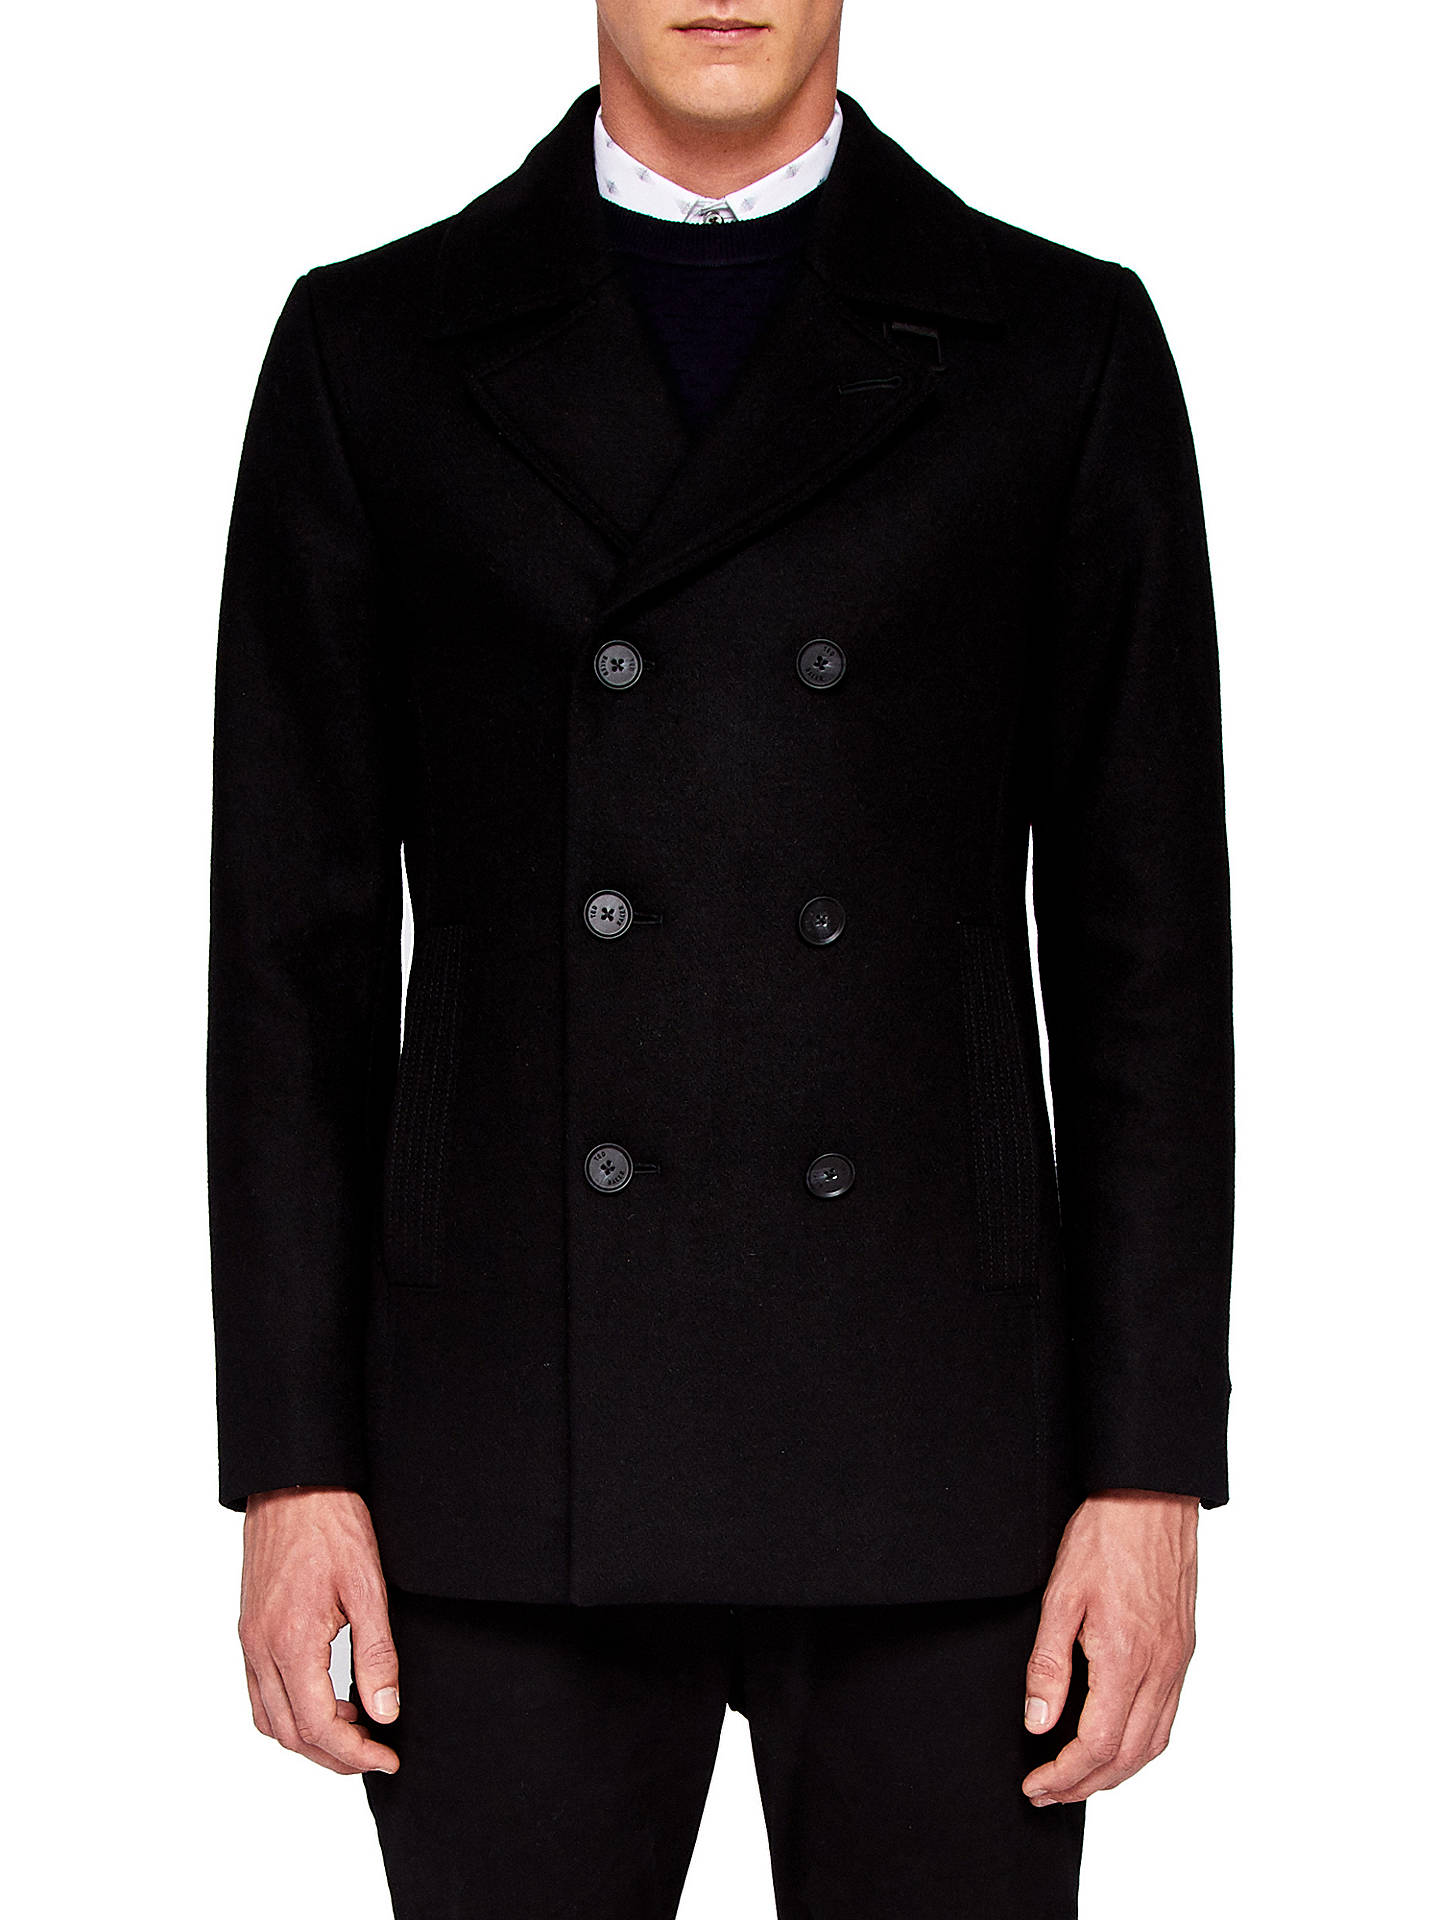 TED BAKER Mens BLACK WOOL PEA COAT 44 46 Long Size XXL WORN ONCE JACKET